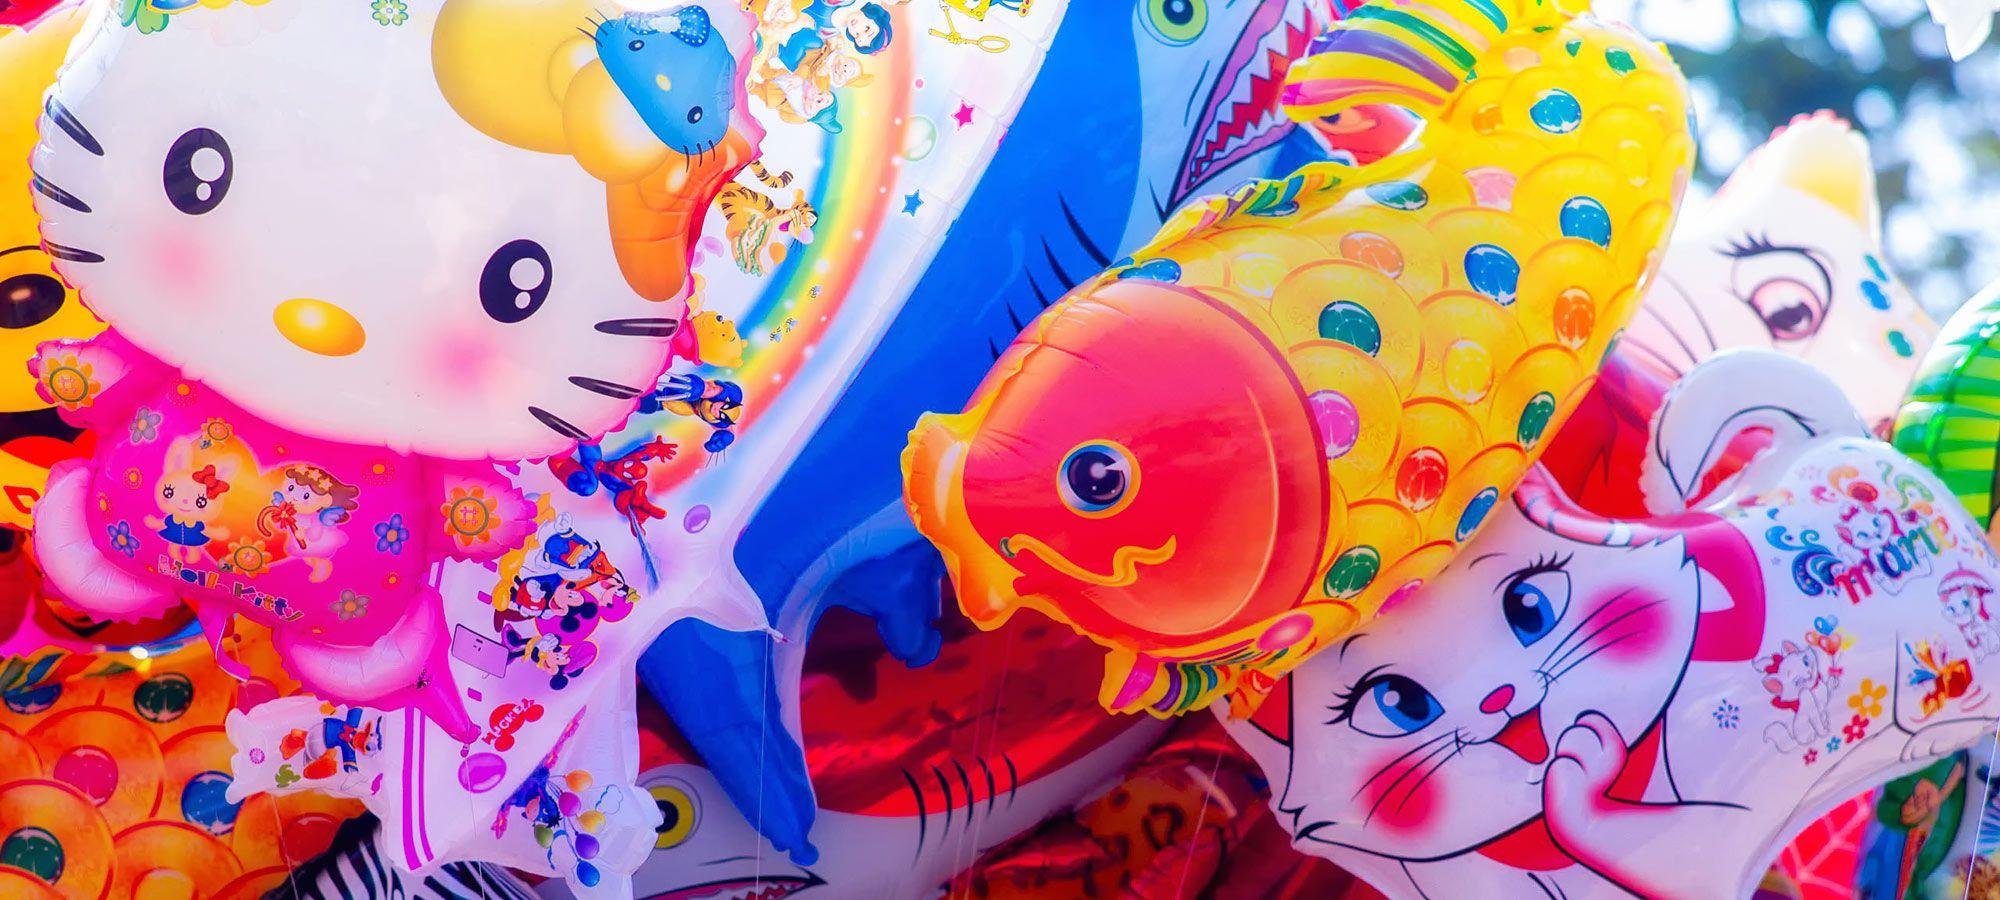 farbige Luftballons mit Tiermotiven